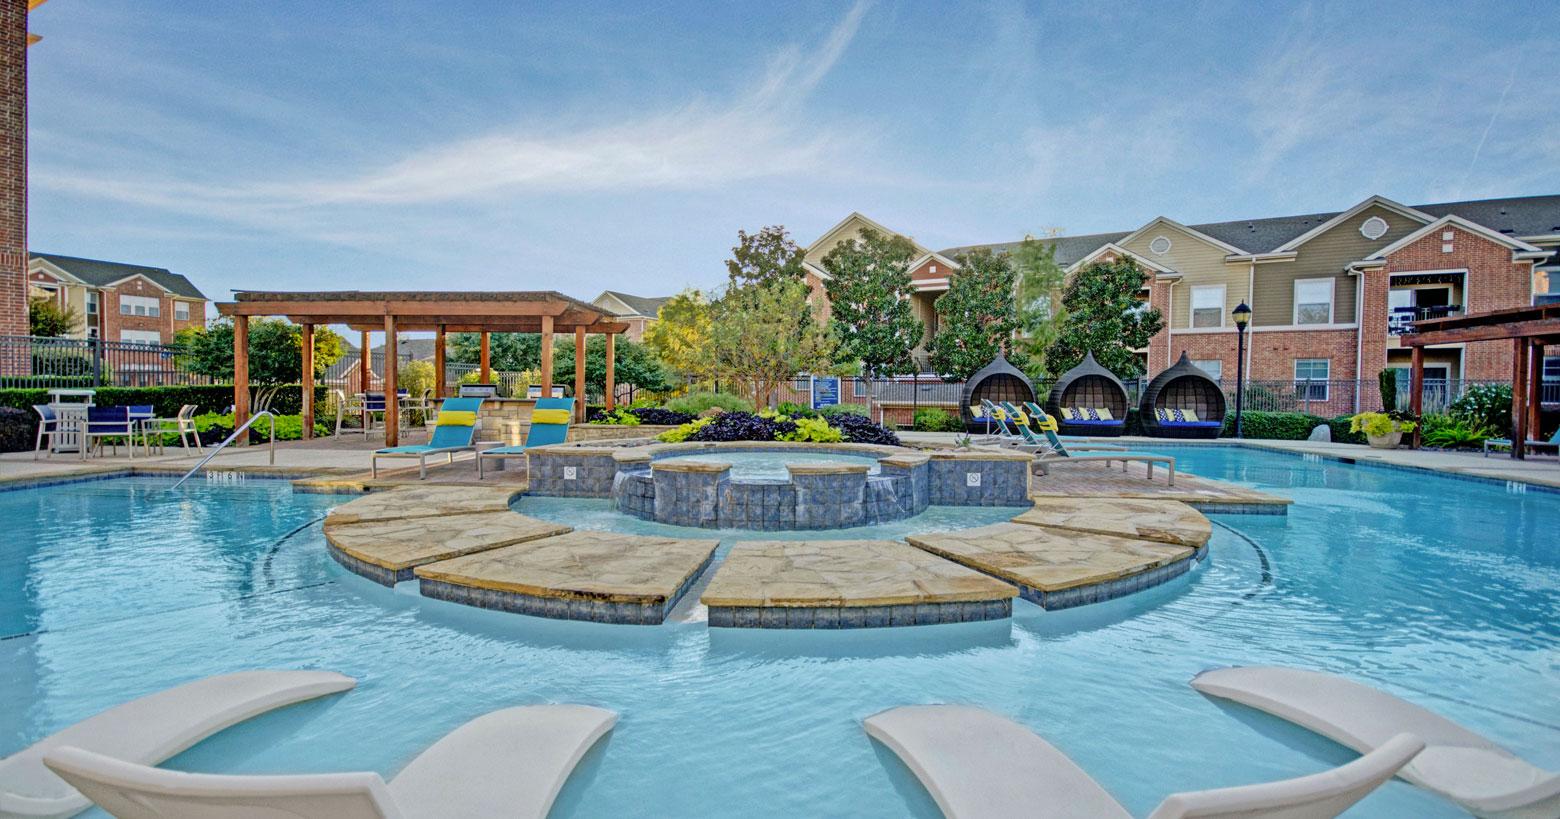 Vista 121 Apartments in Lewisville TX